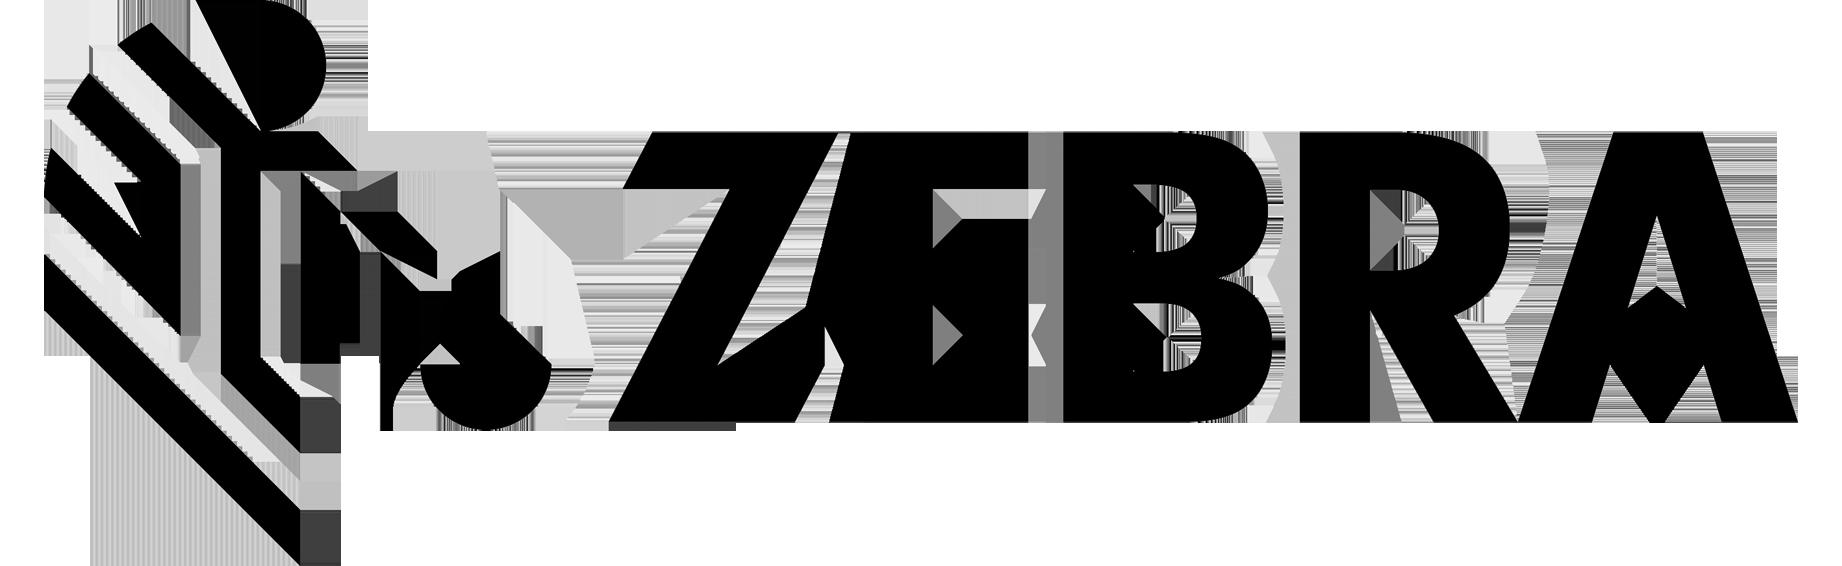 zebra_stampanti_etichette